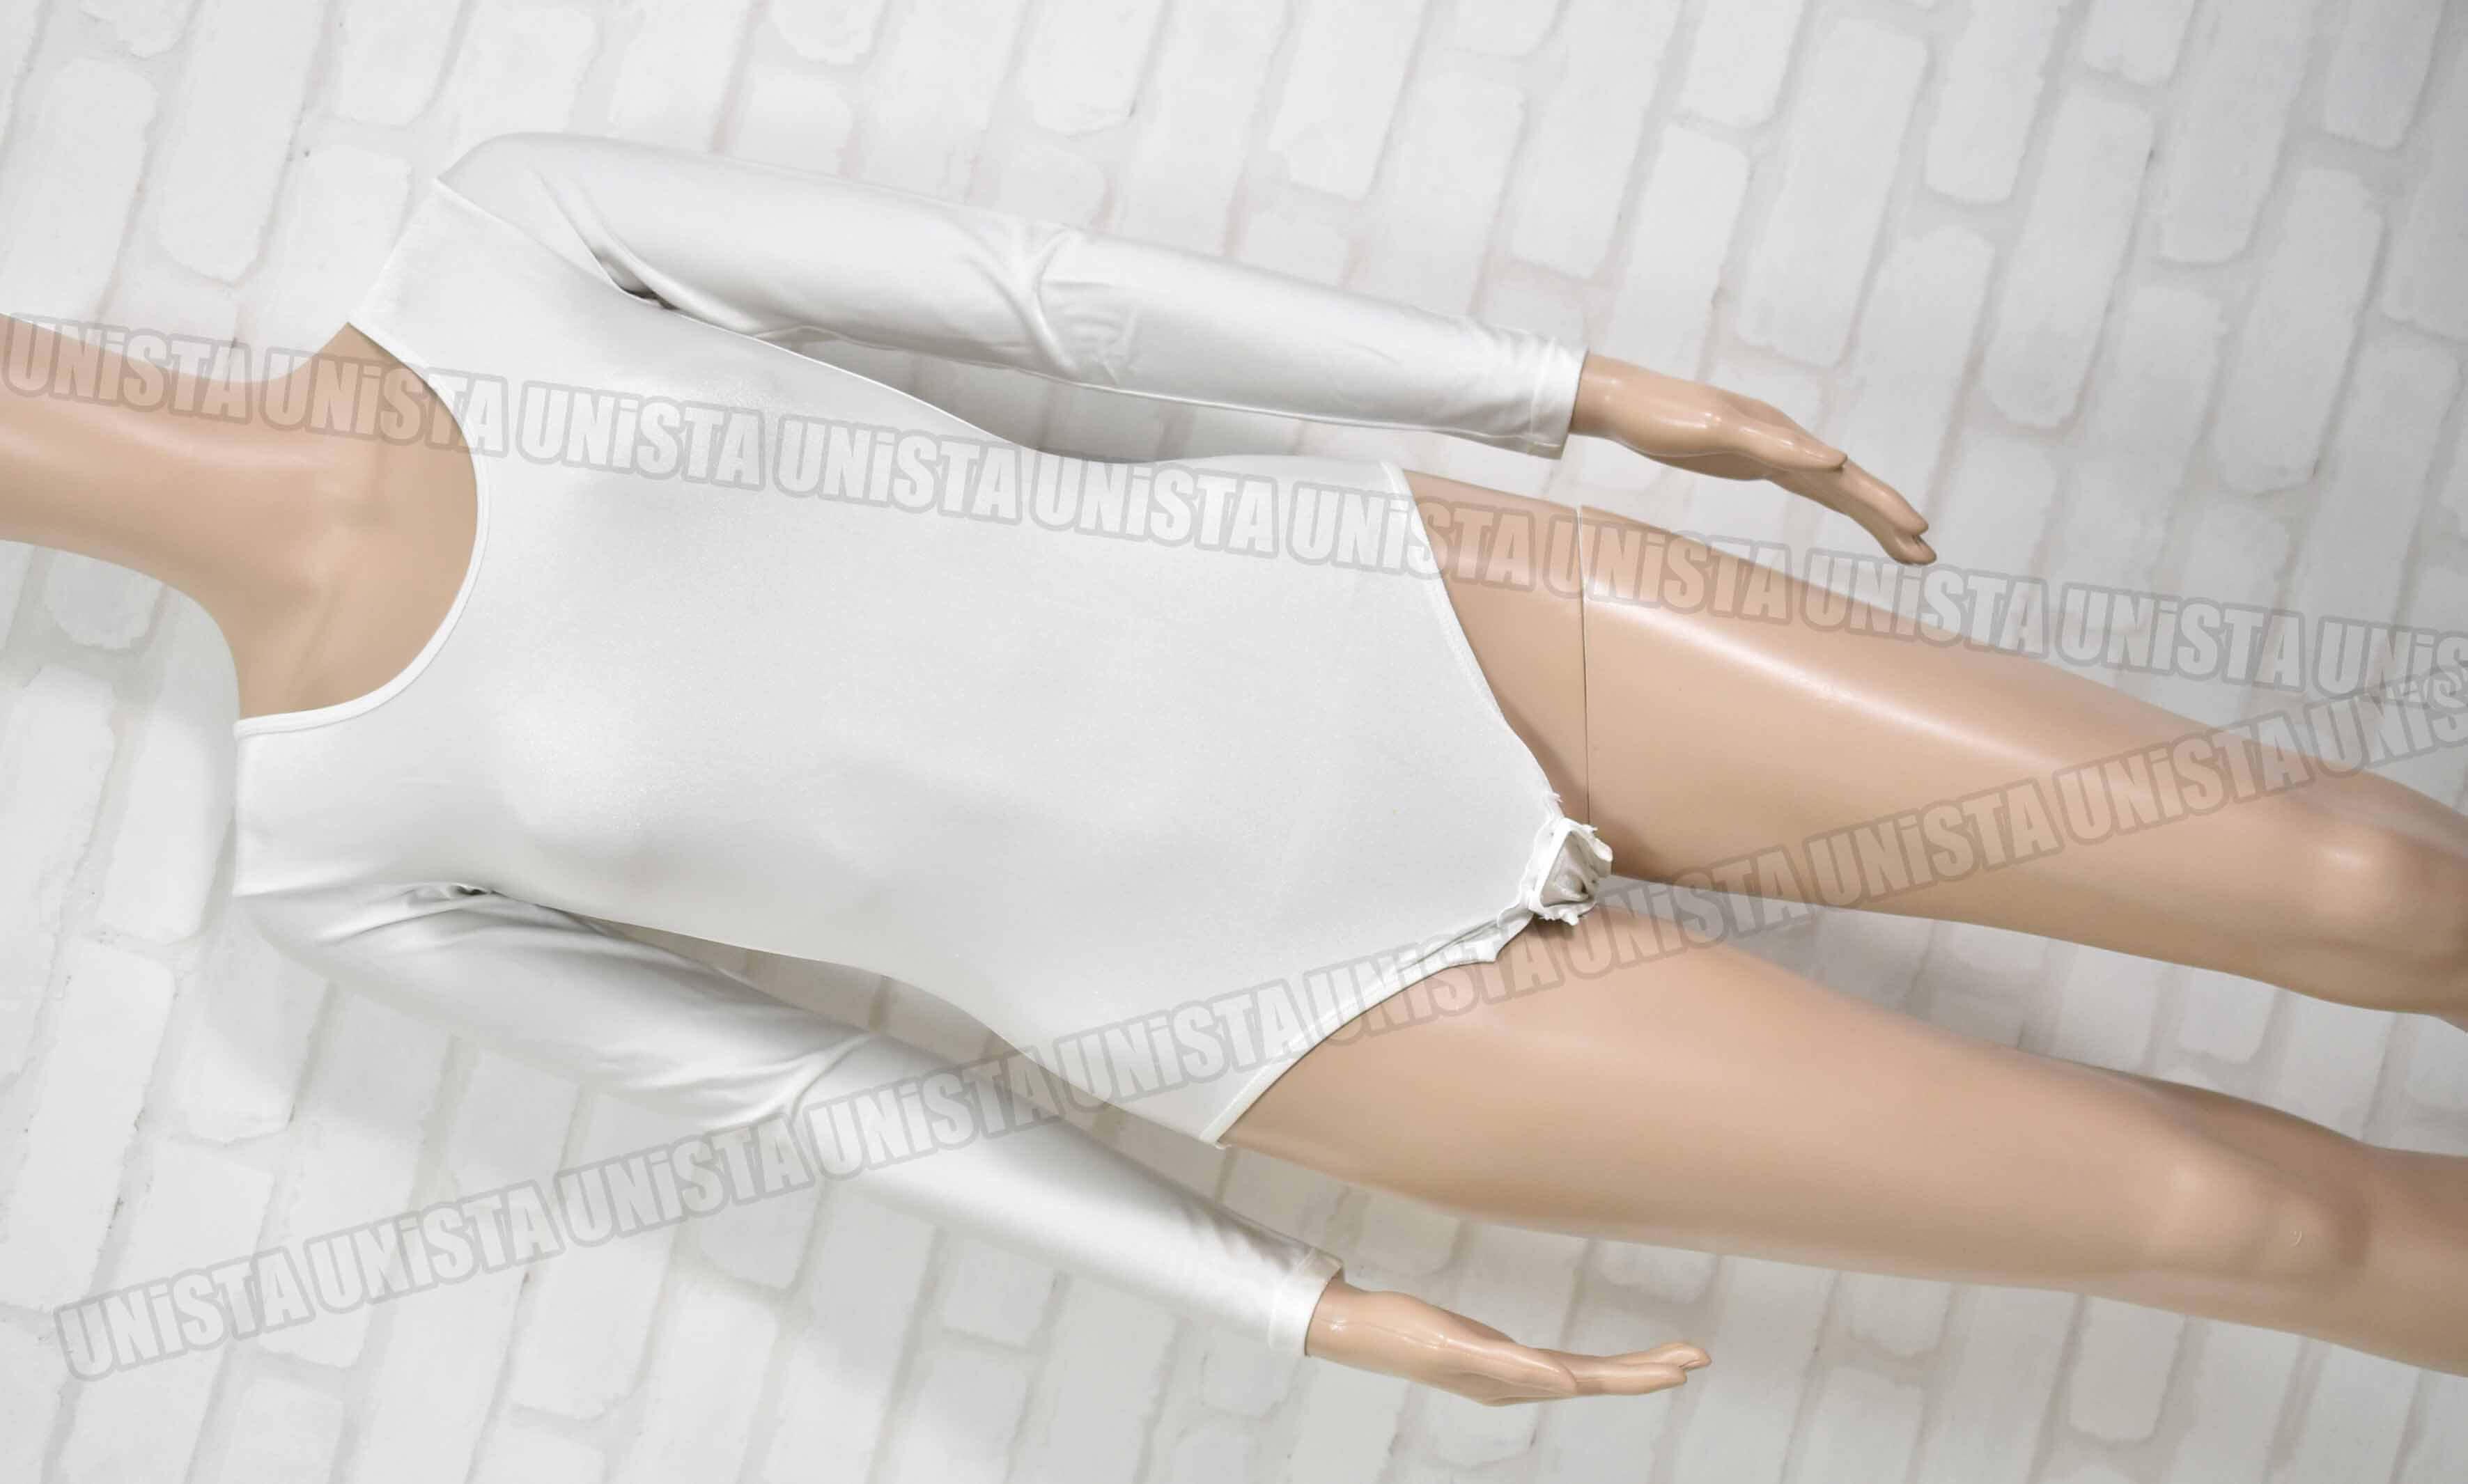 mituri ミトゥリ 女子バレエ・ダンス クロッチホック型 ロングスリーブレオタード 無地 ホワイト